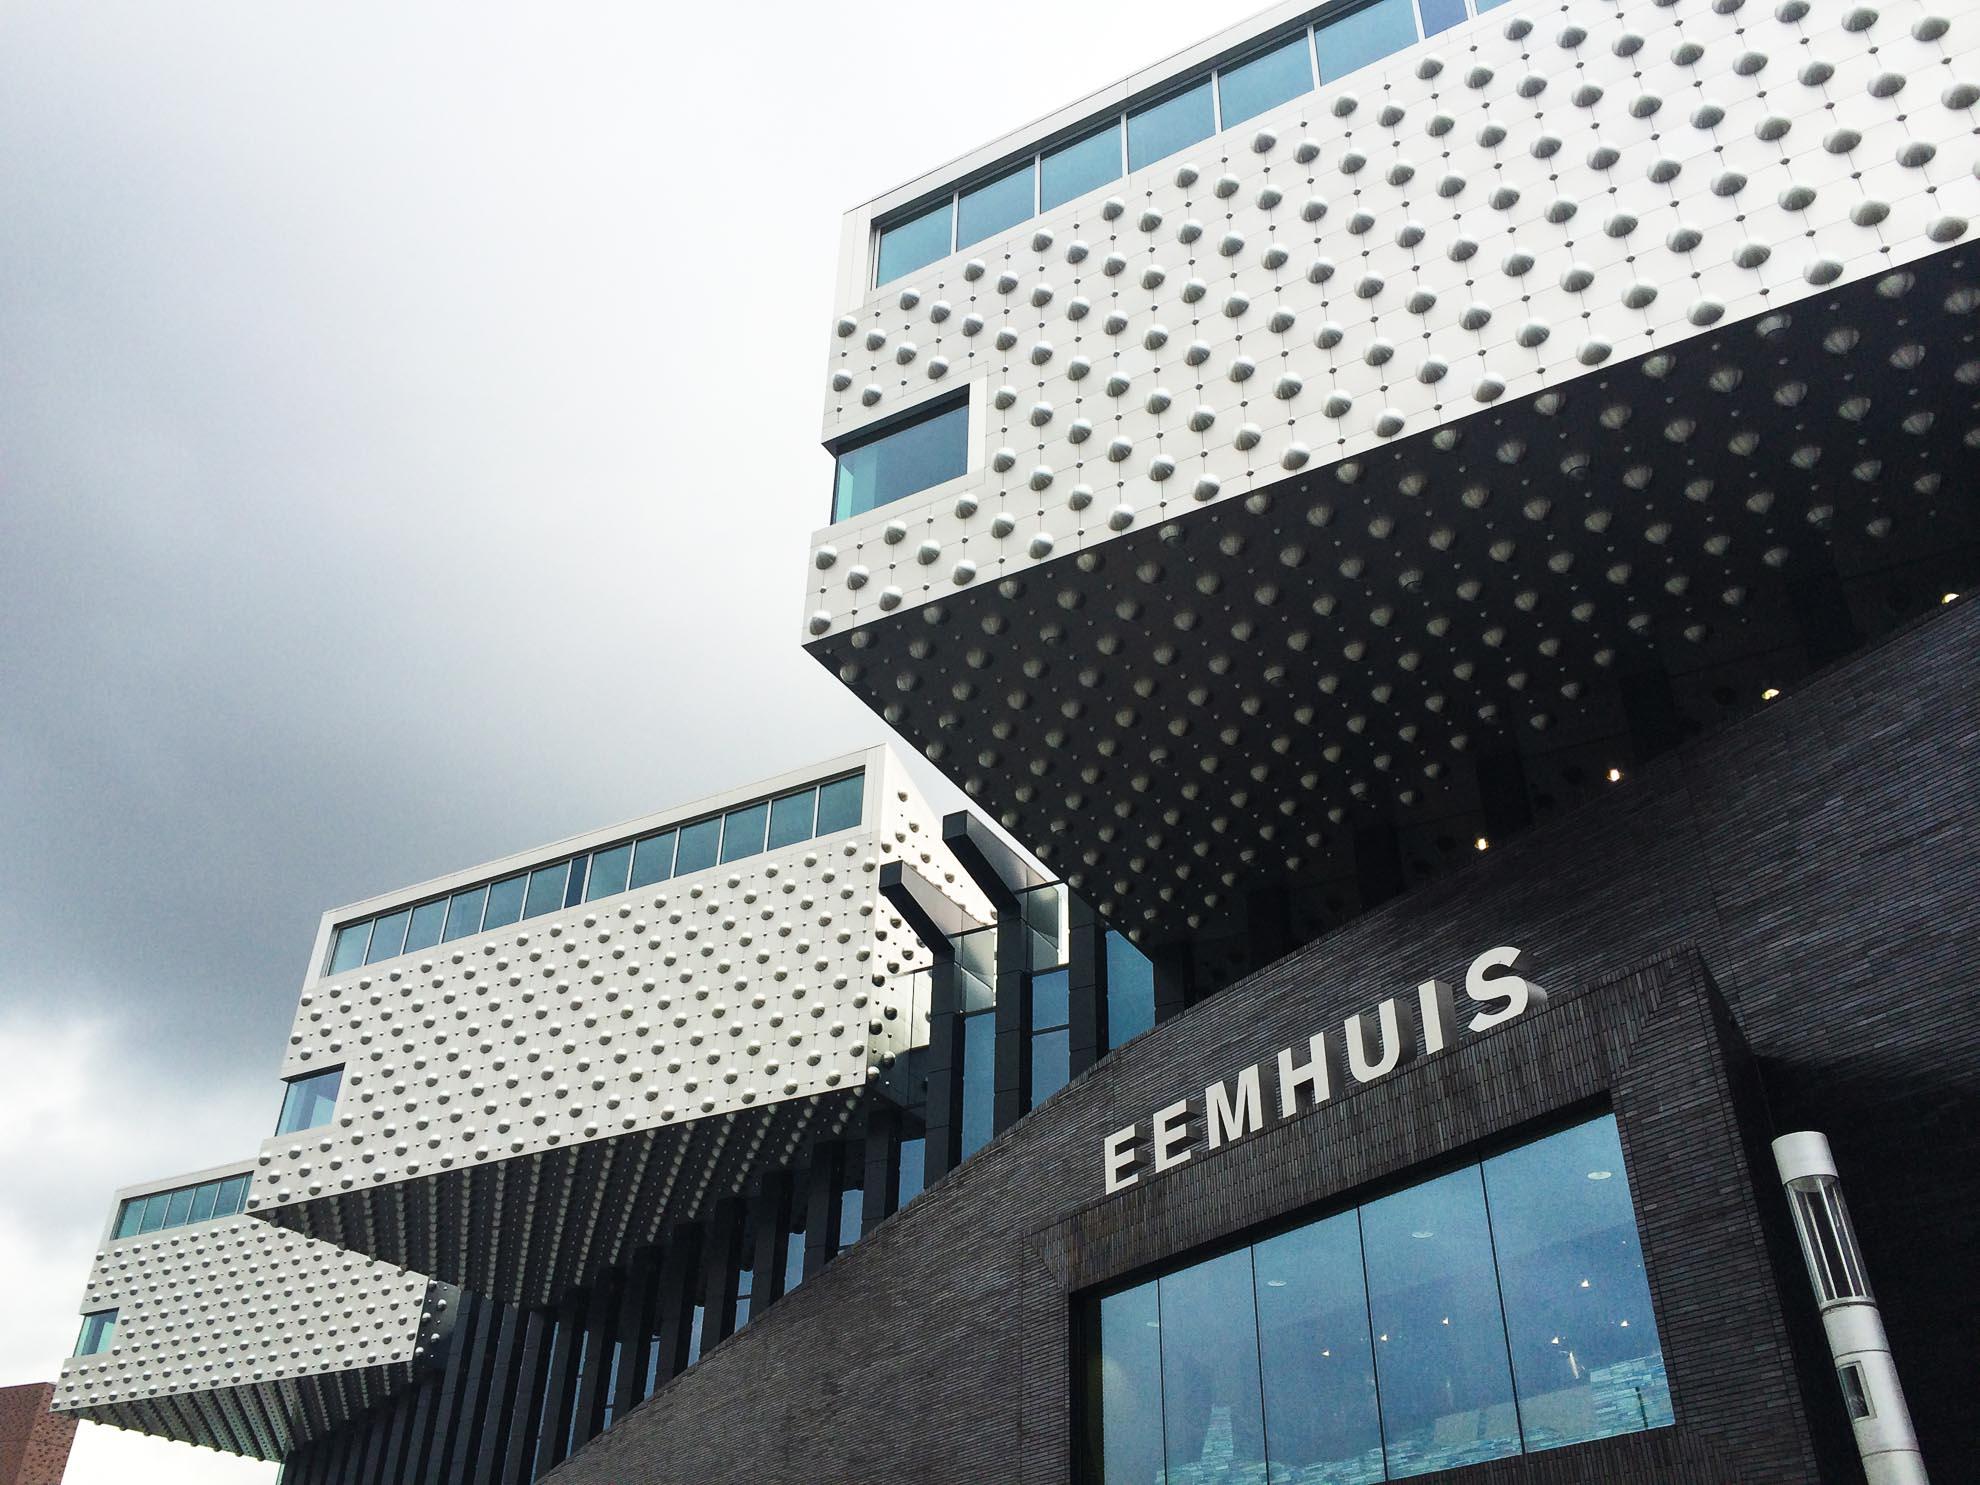 Centro-cultural-Eemhuis.-Amersfoort-Holanda.-larson-3-2_1606751558.jpg